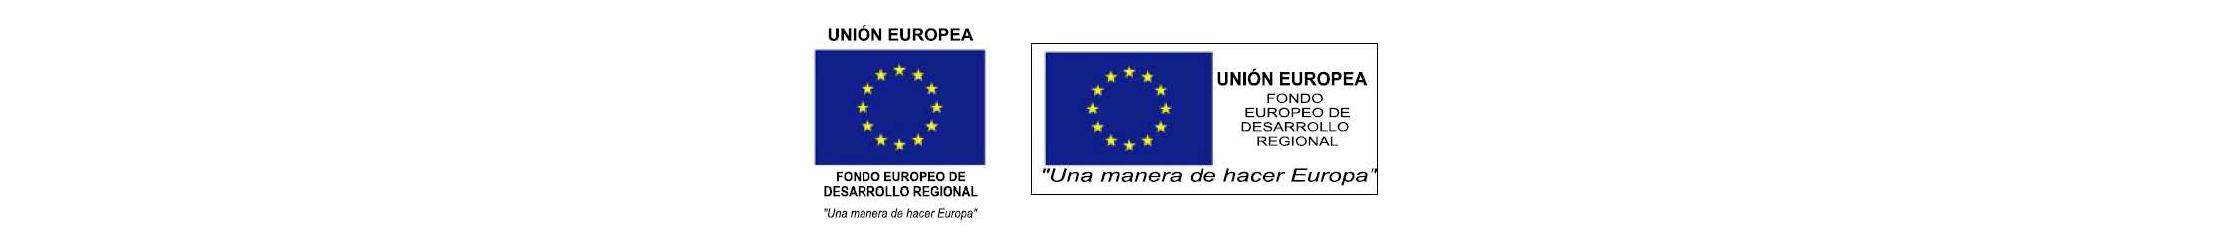 LOGO_UE_PDF